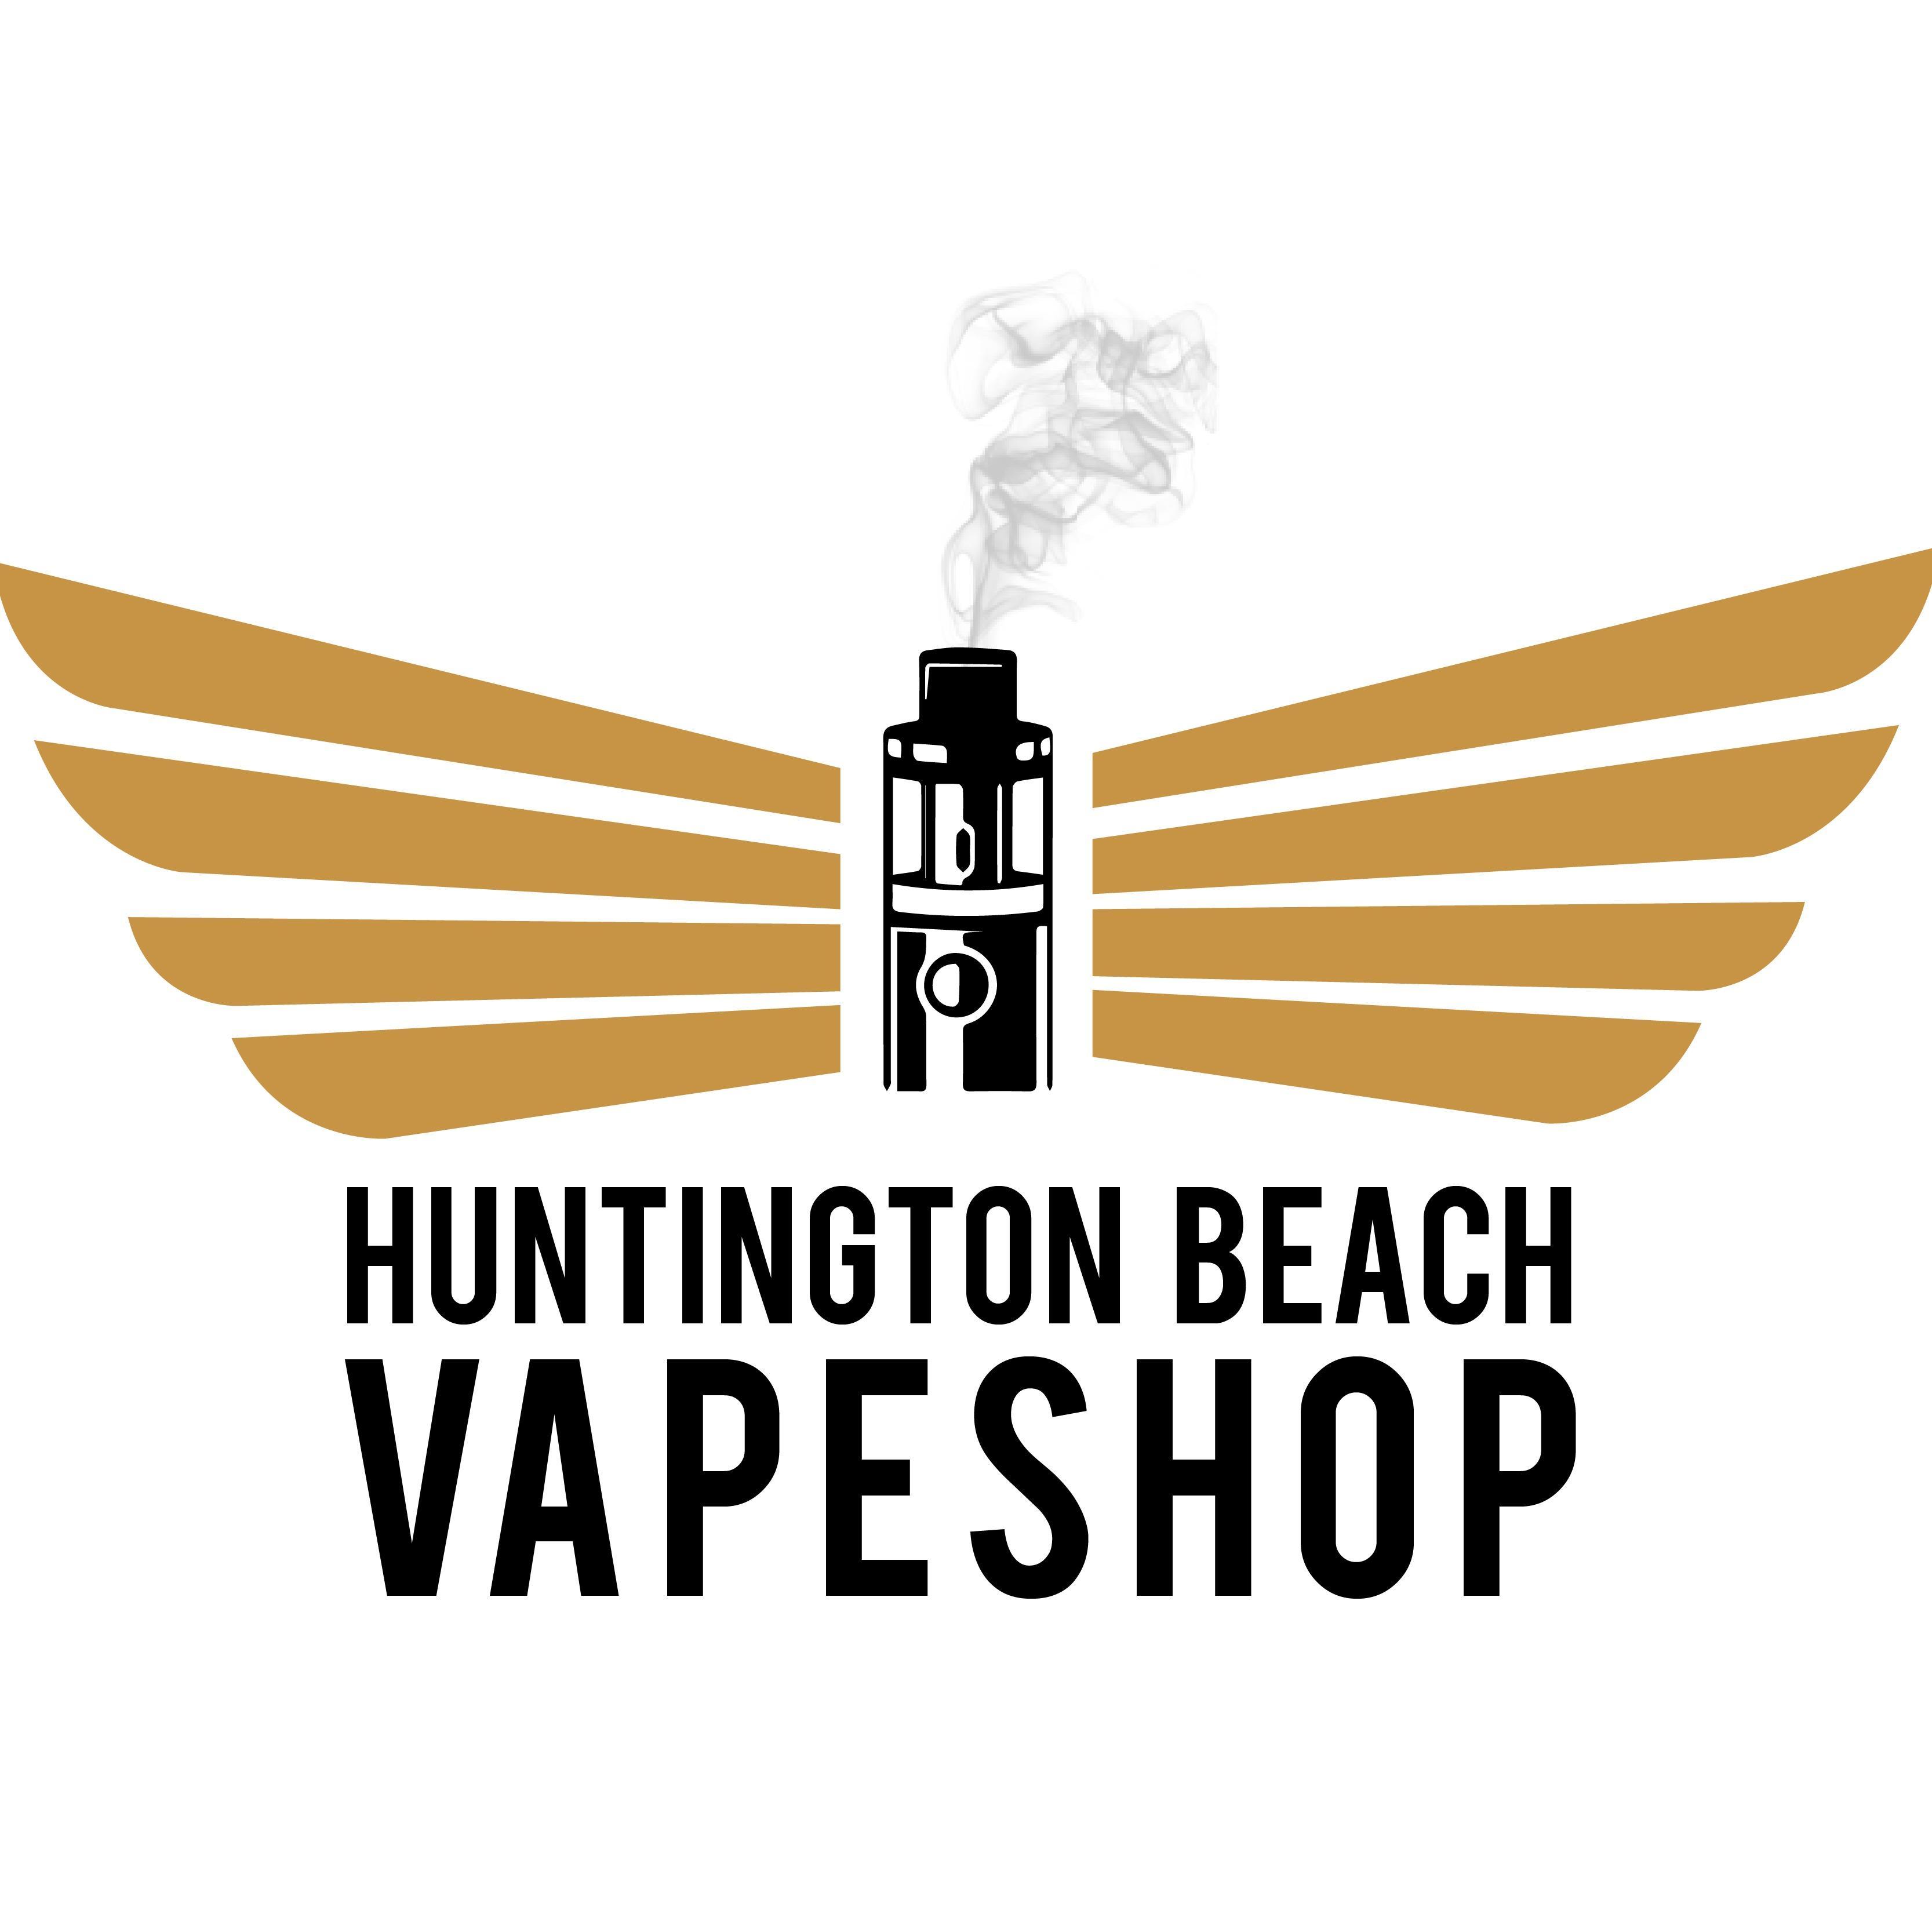 Huntington Beach Vape Shop